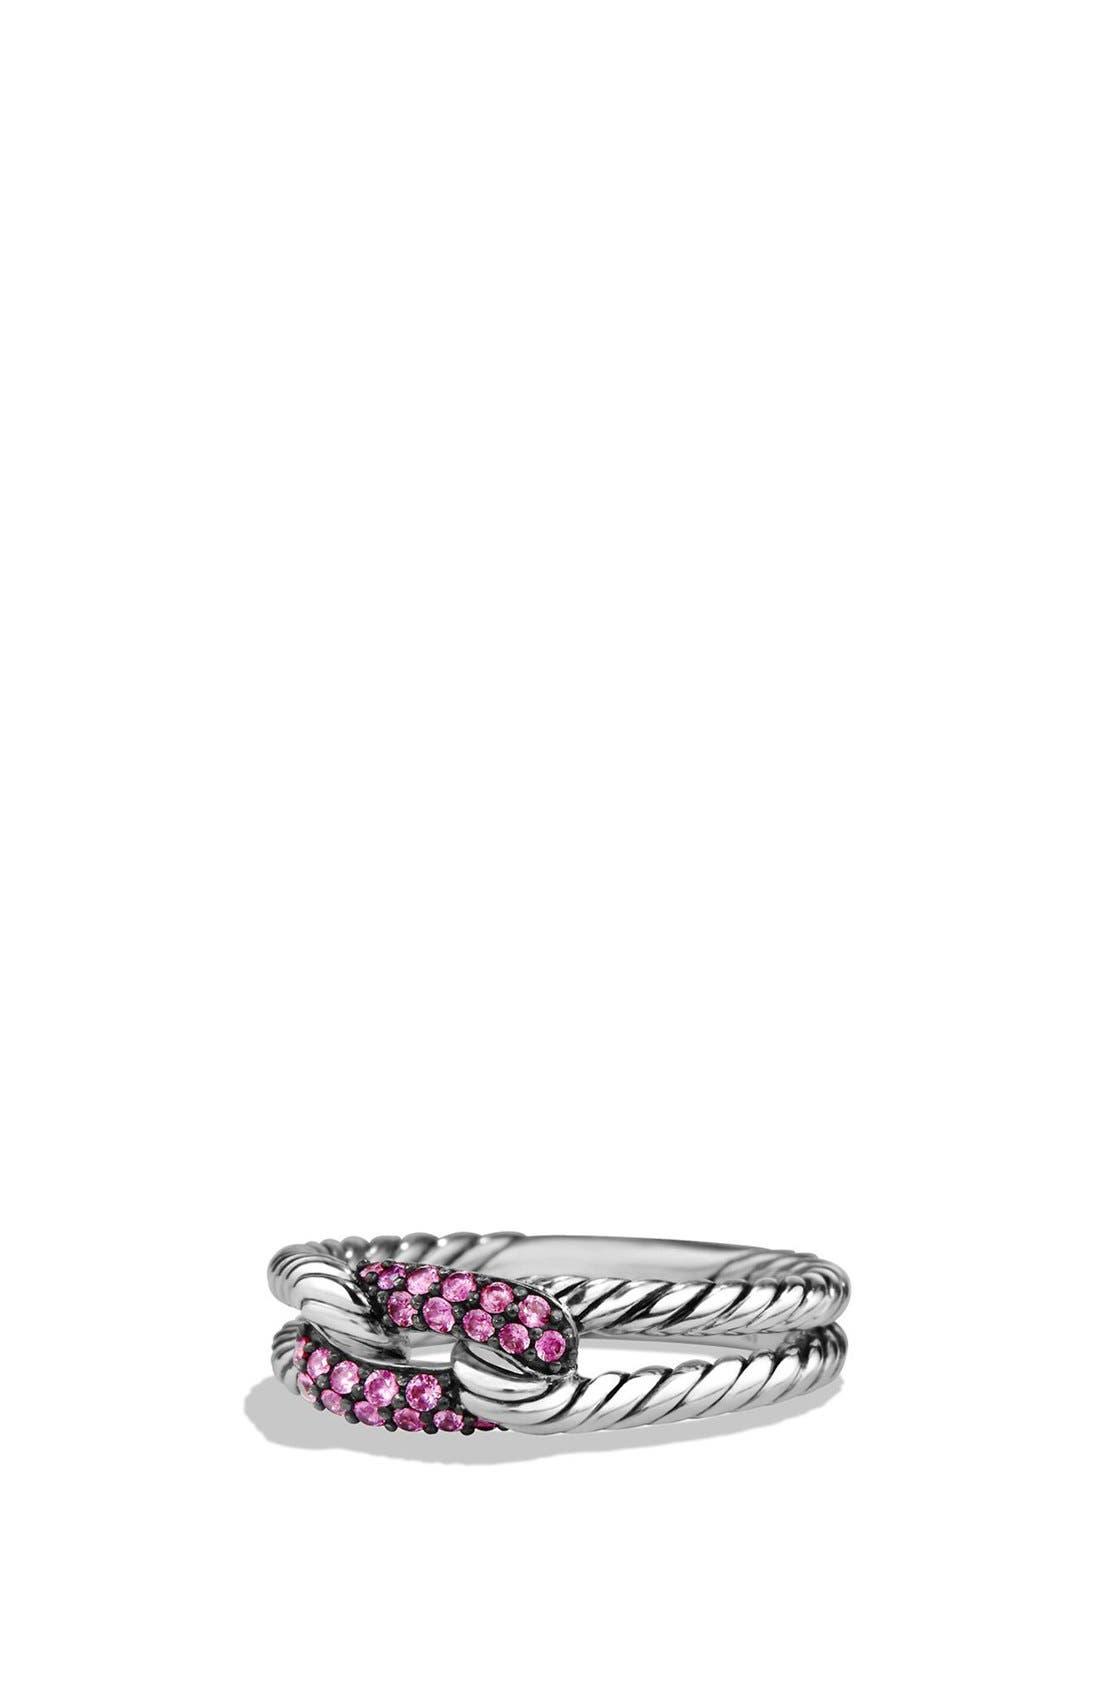 DAVID YURMAN Petite Pavé Loop Ring with Sapphires